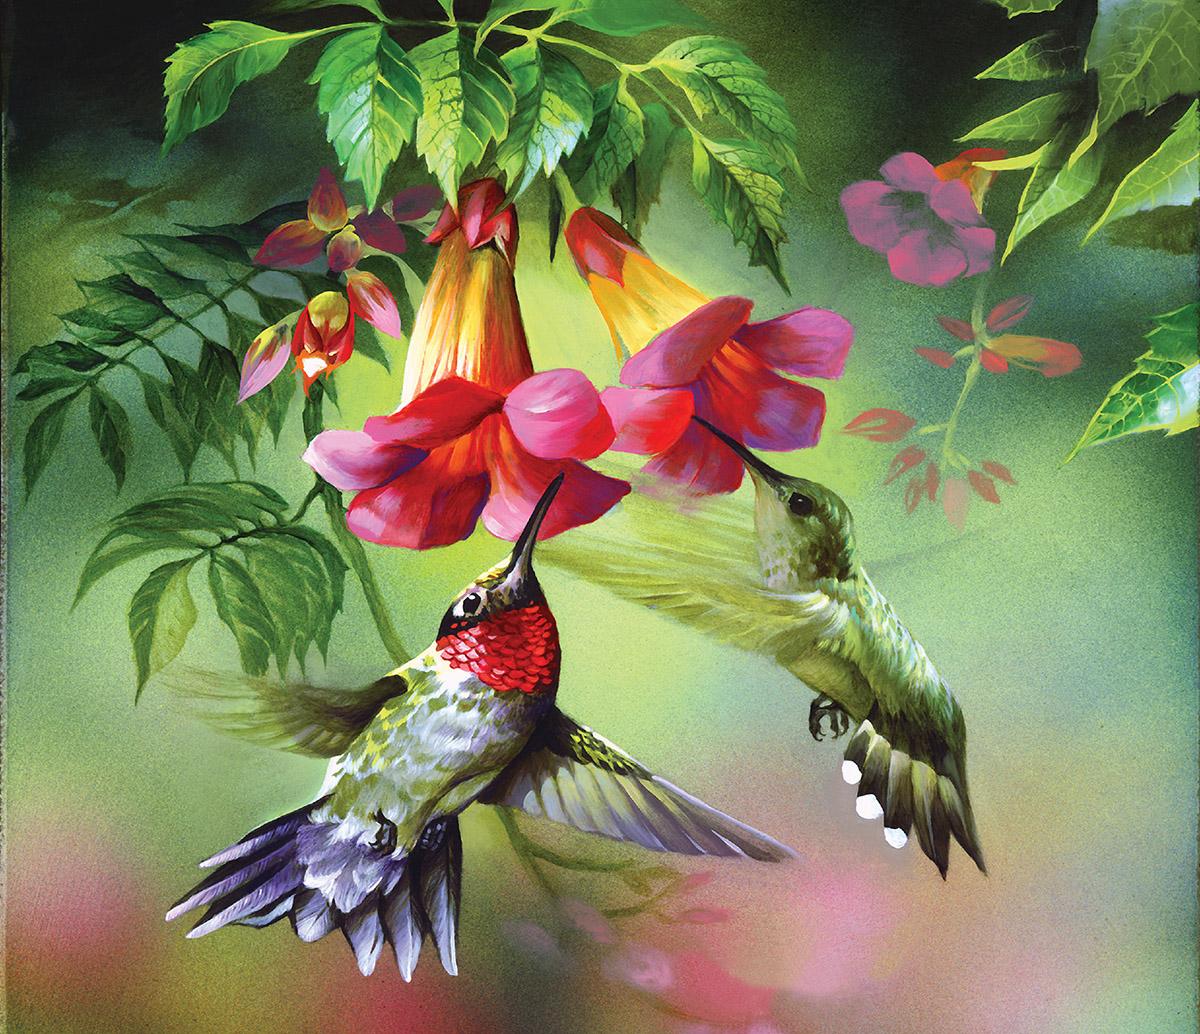 Hummingbirds Dementia / Alzheimer's Jigsaw Puzzle